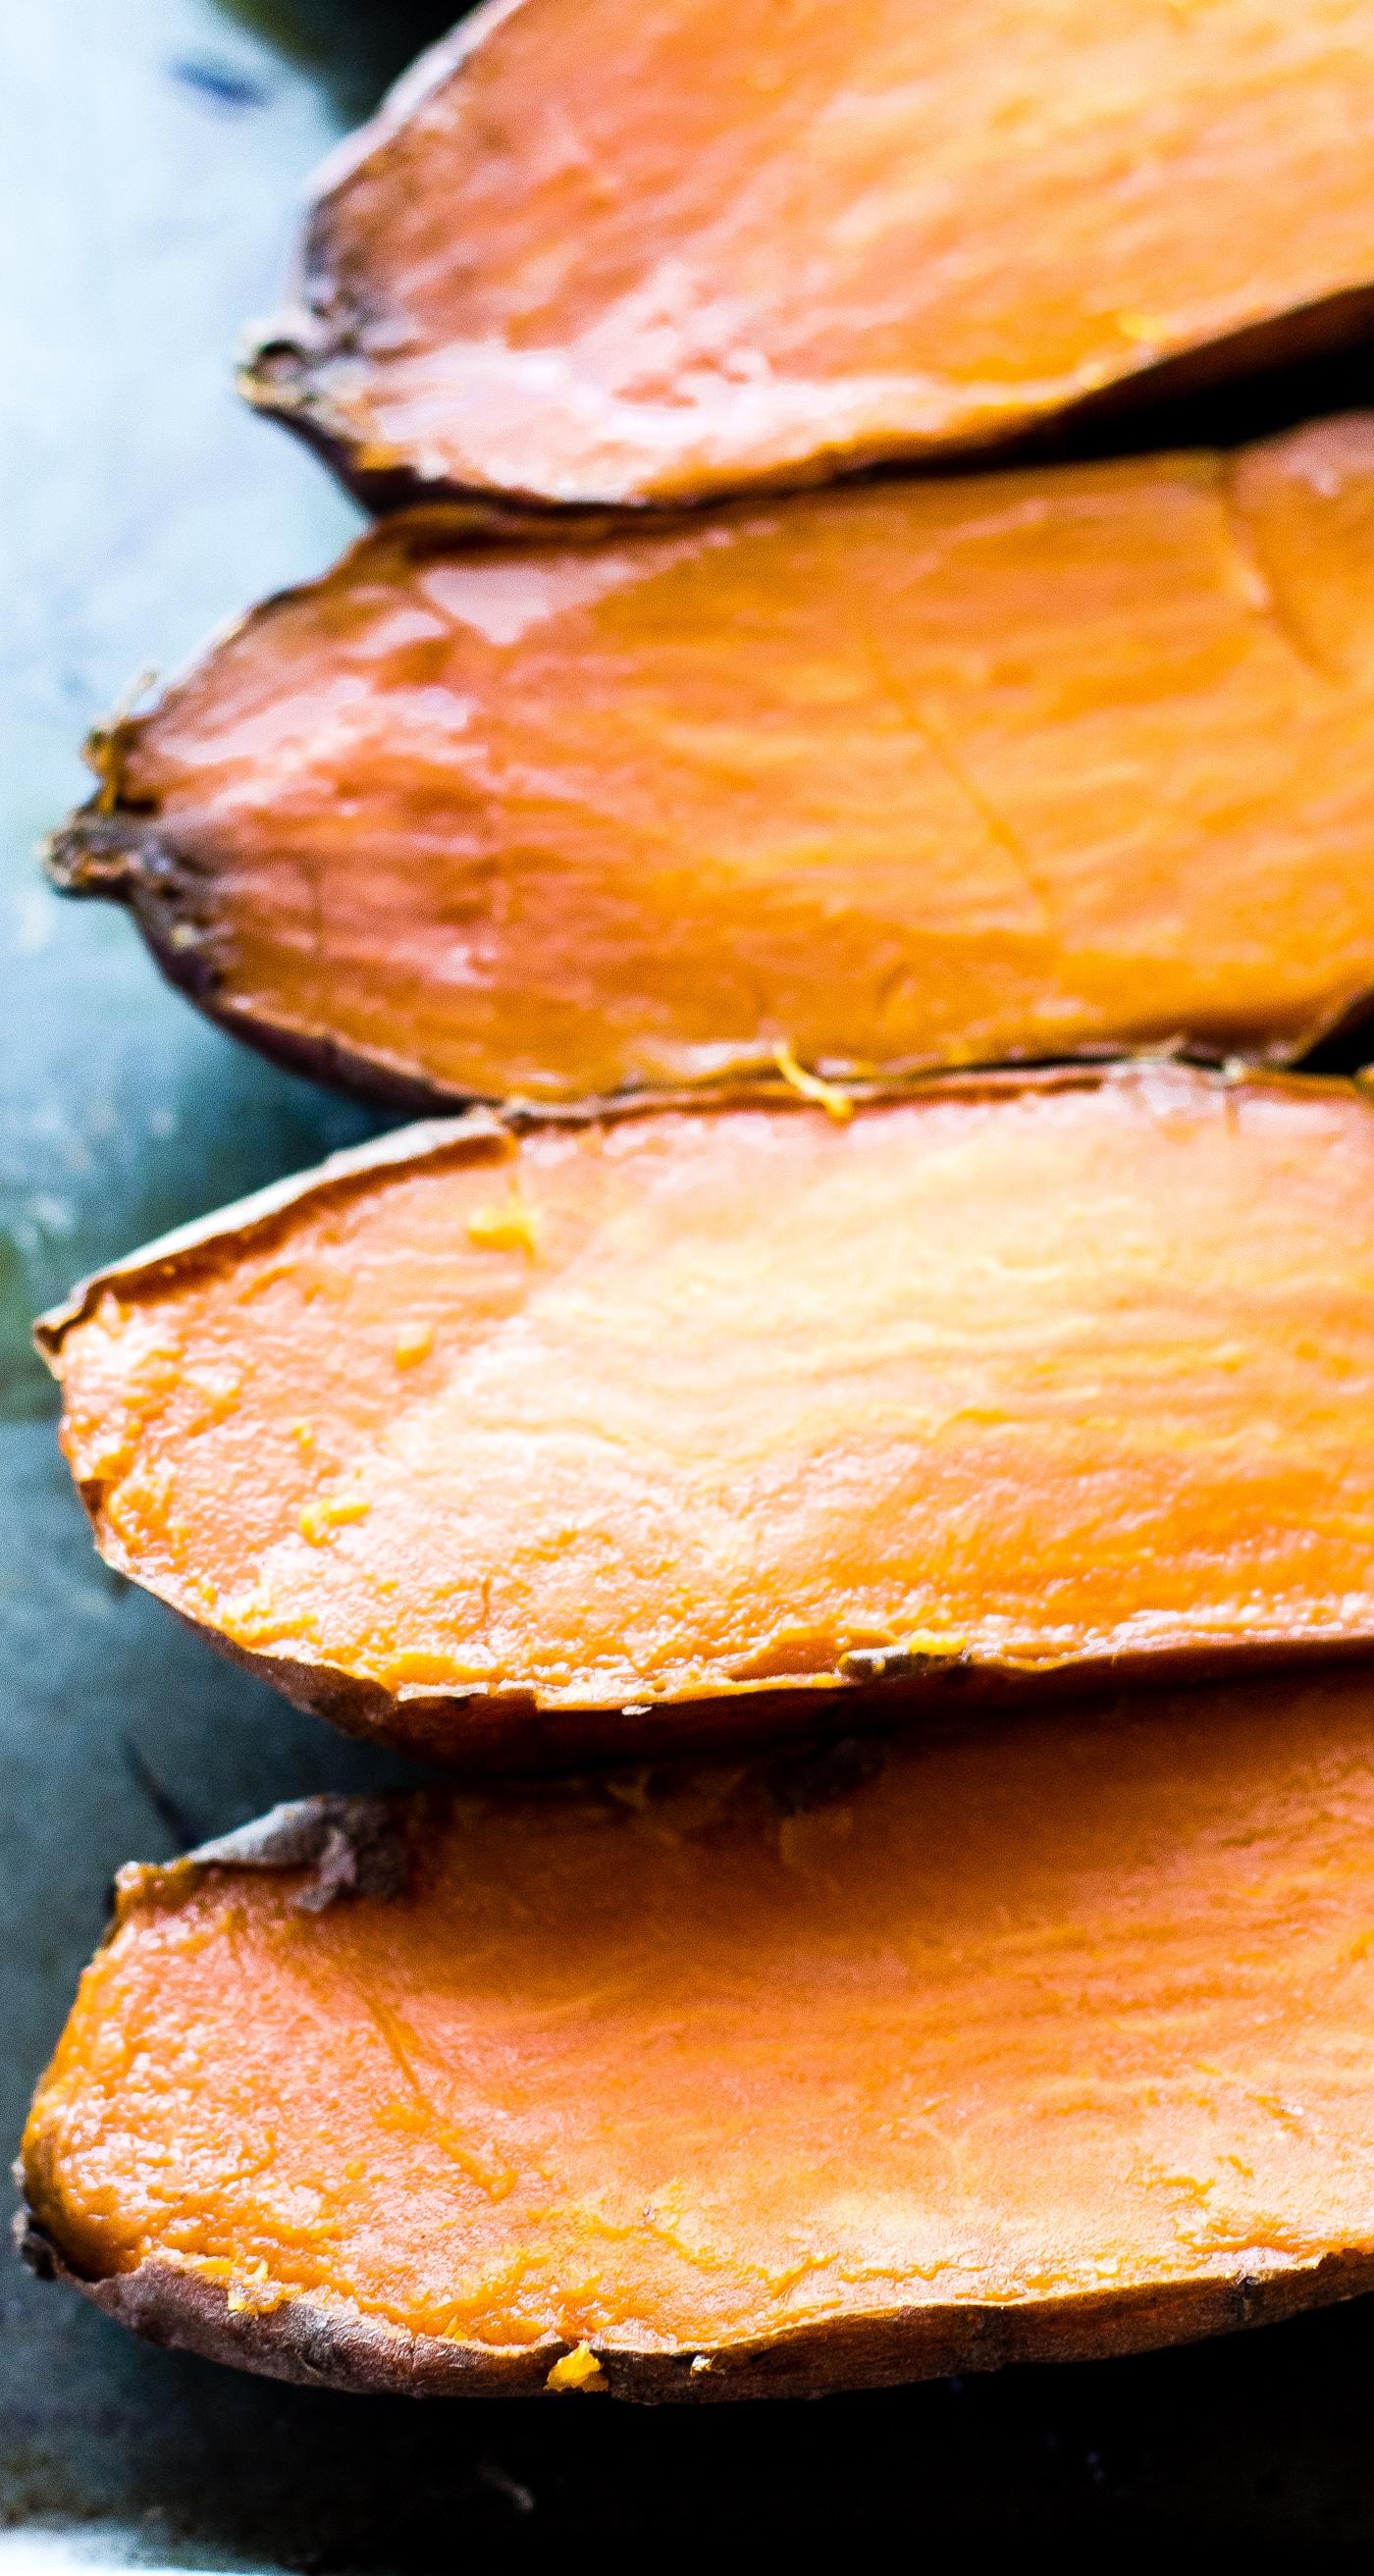 baked sweet potatoes, sliced in half